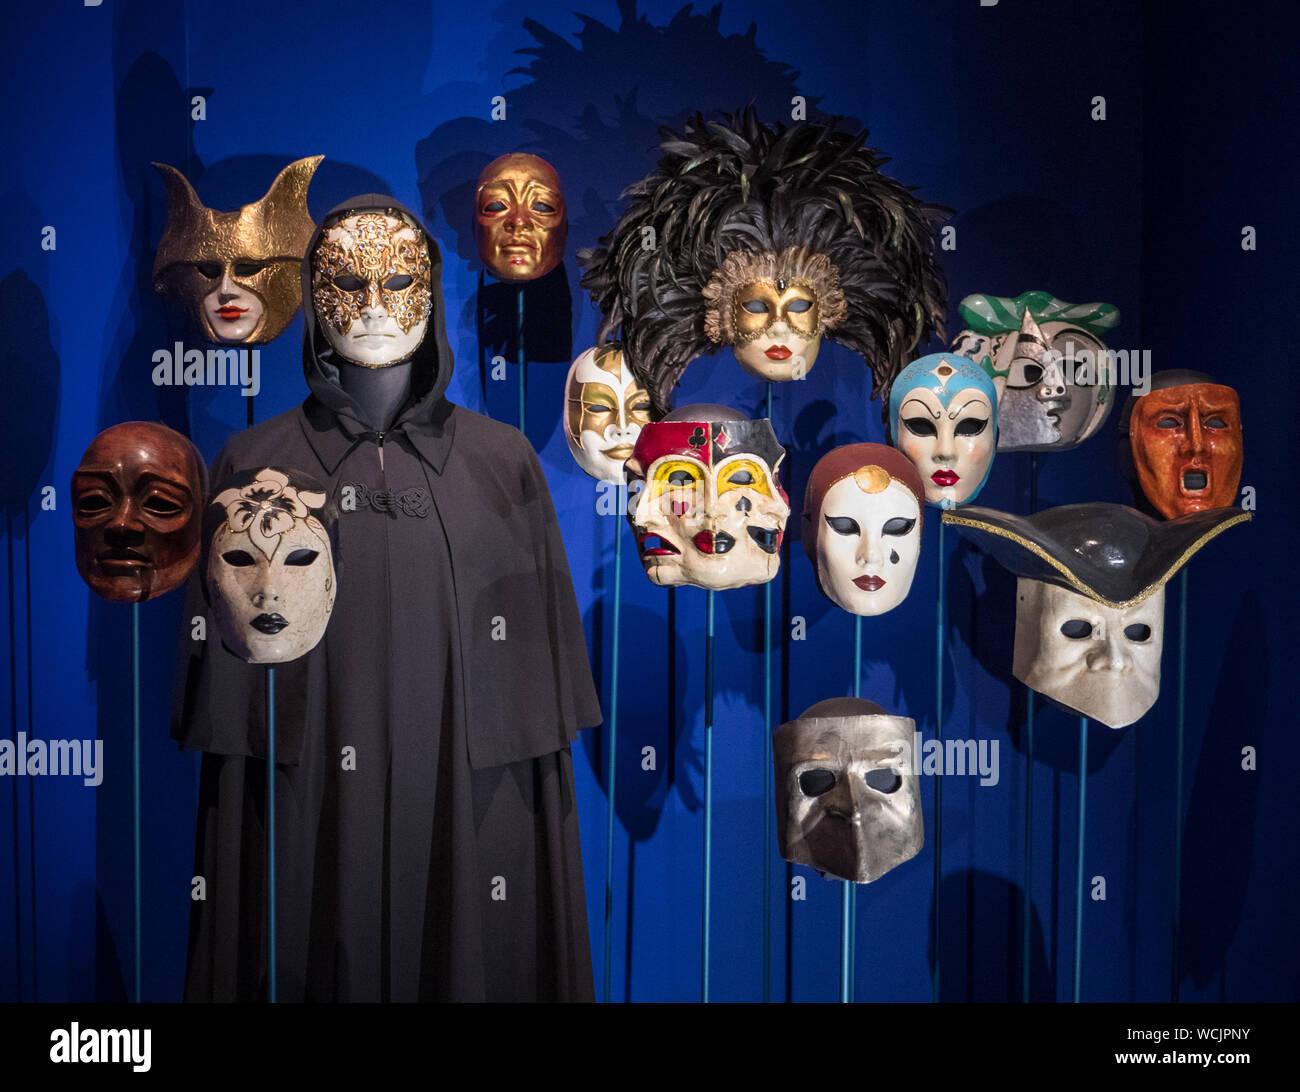 Eyes Wide Shut Masks Stanley Kubrick The Exhibition Design Museum London Uk Stock Photo Alamy